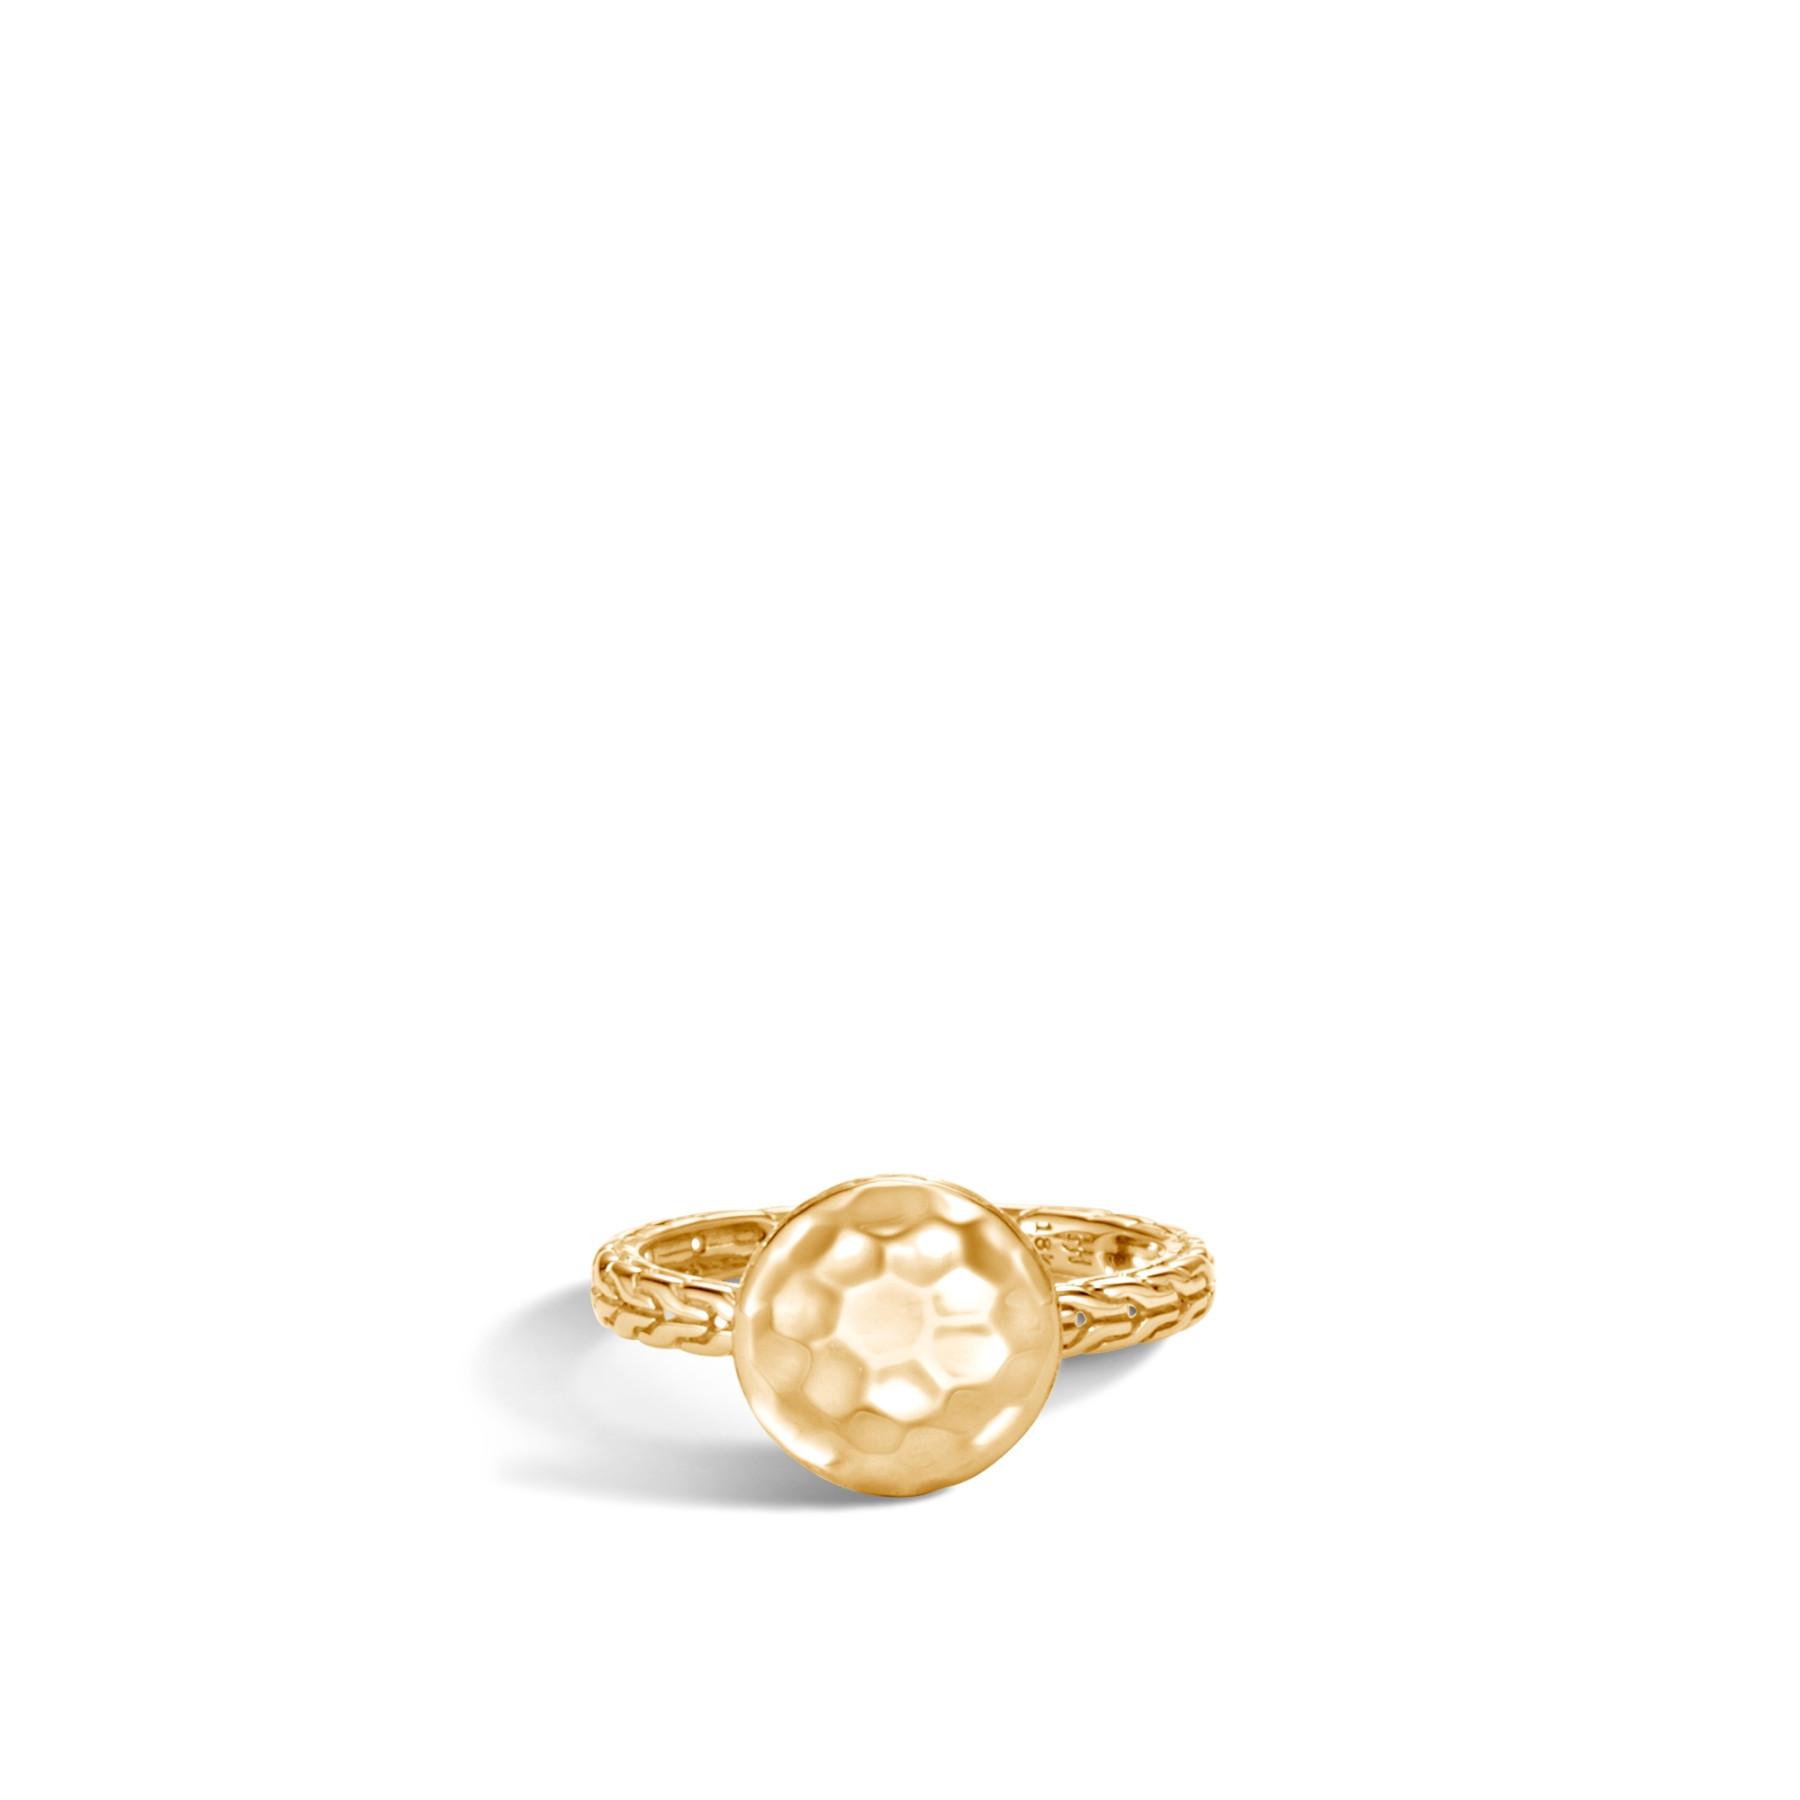 John Hardy Dot Gold Ring alt 2 image